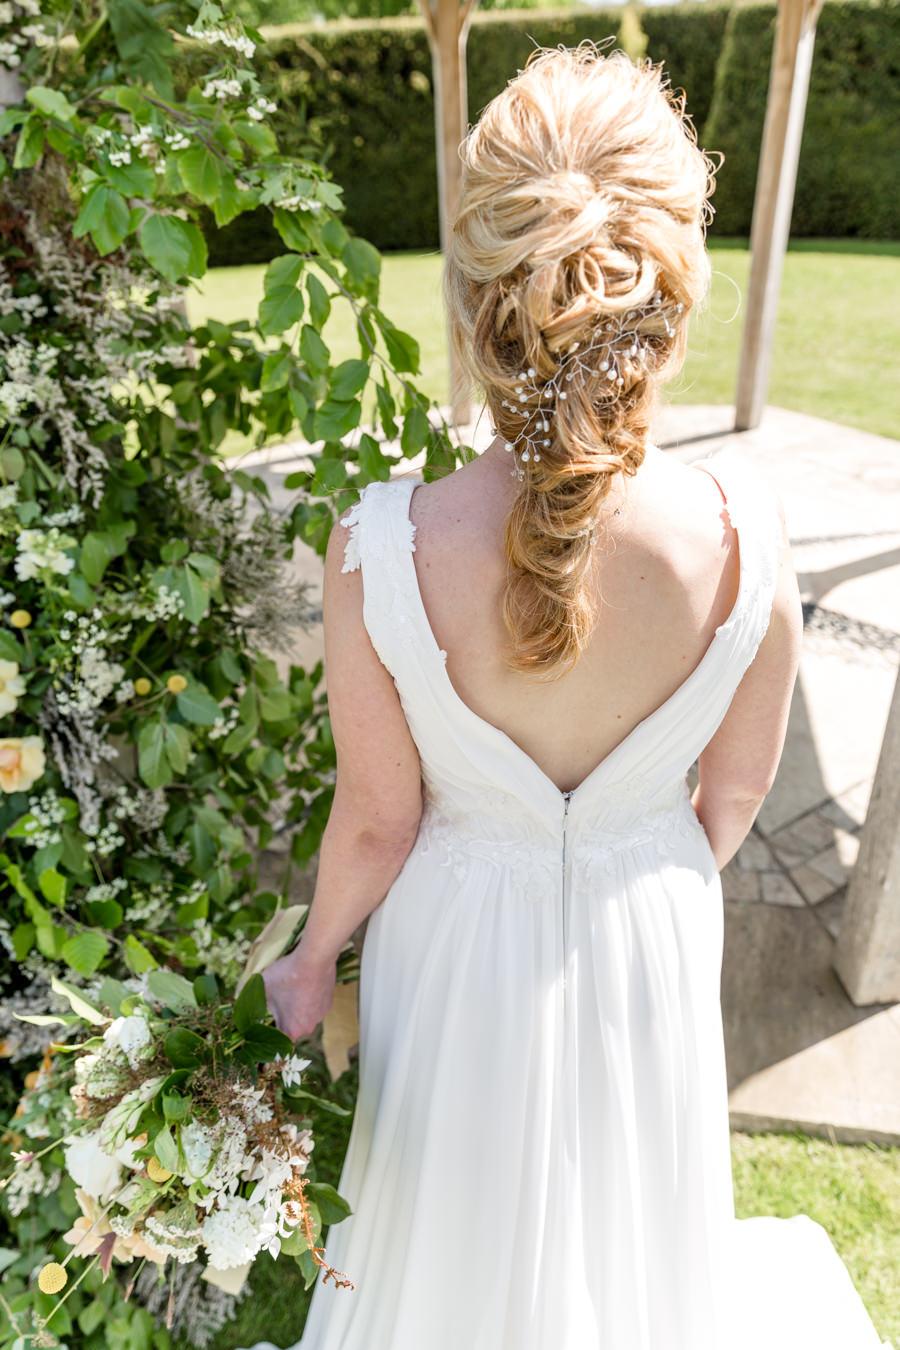 Boho luxe wedding style with soft orange and muted tones at Chippenham, image credit Heather Jackson Photography (16)